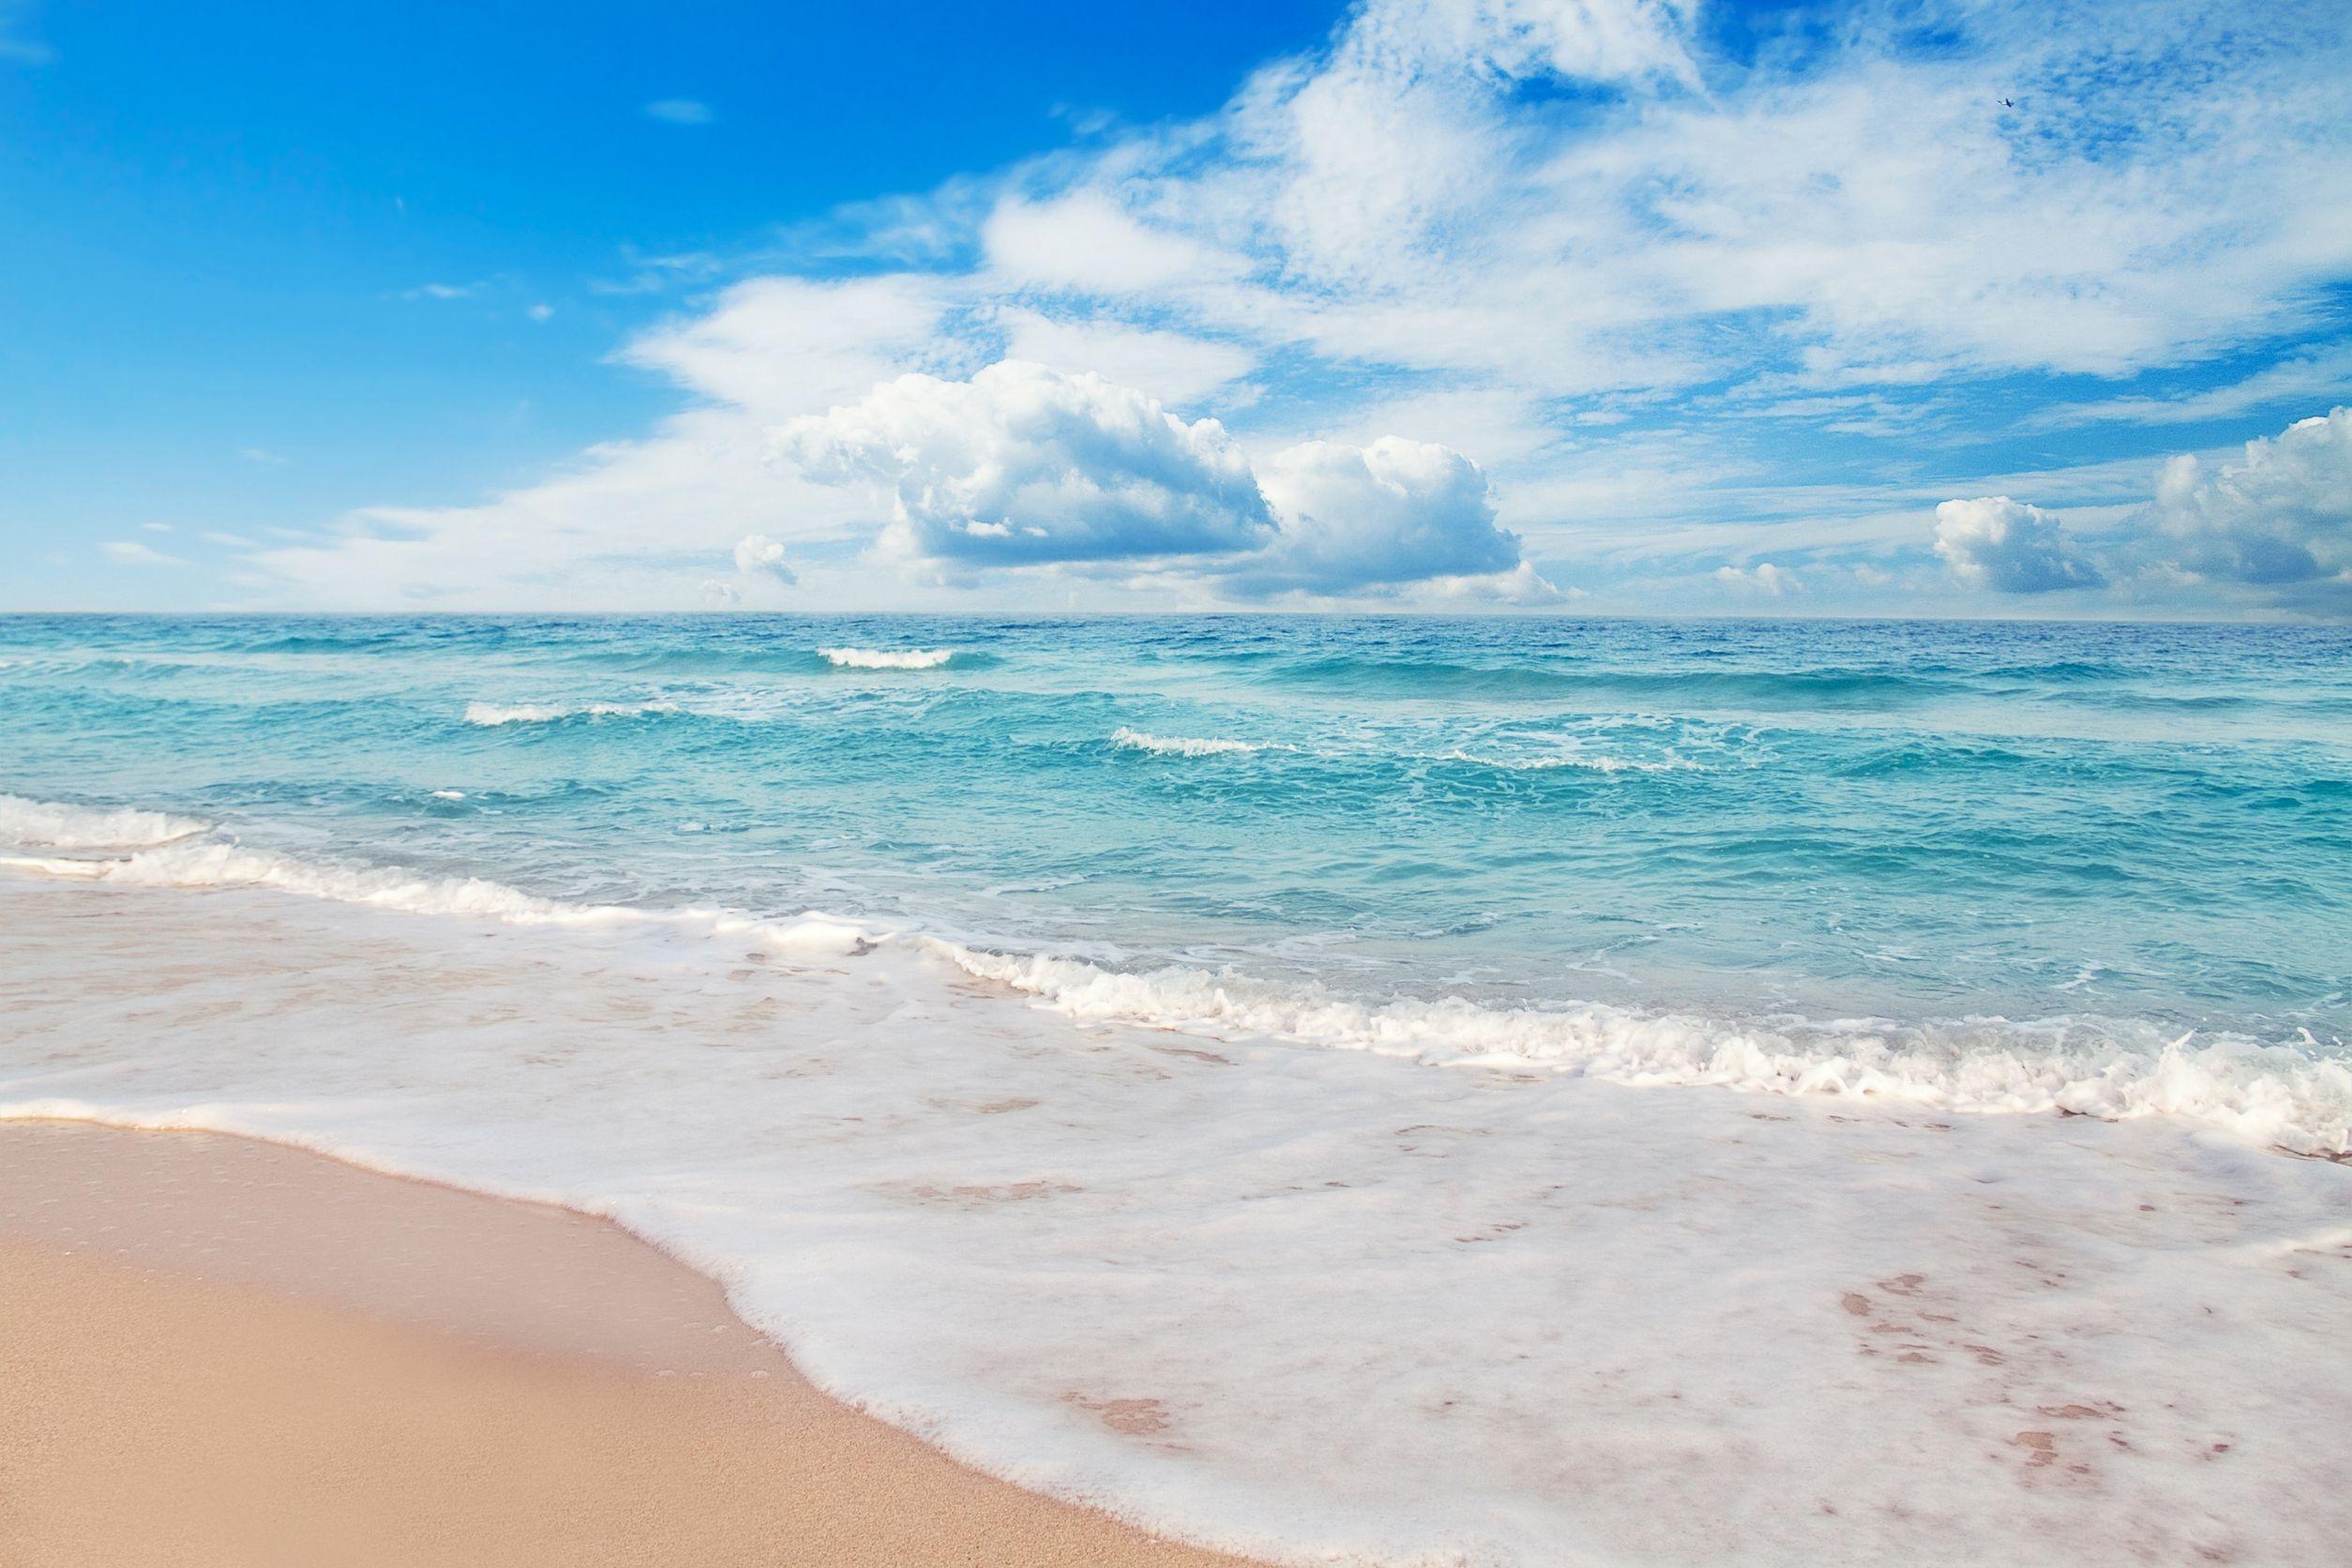 Desalination Brine Treatment Research